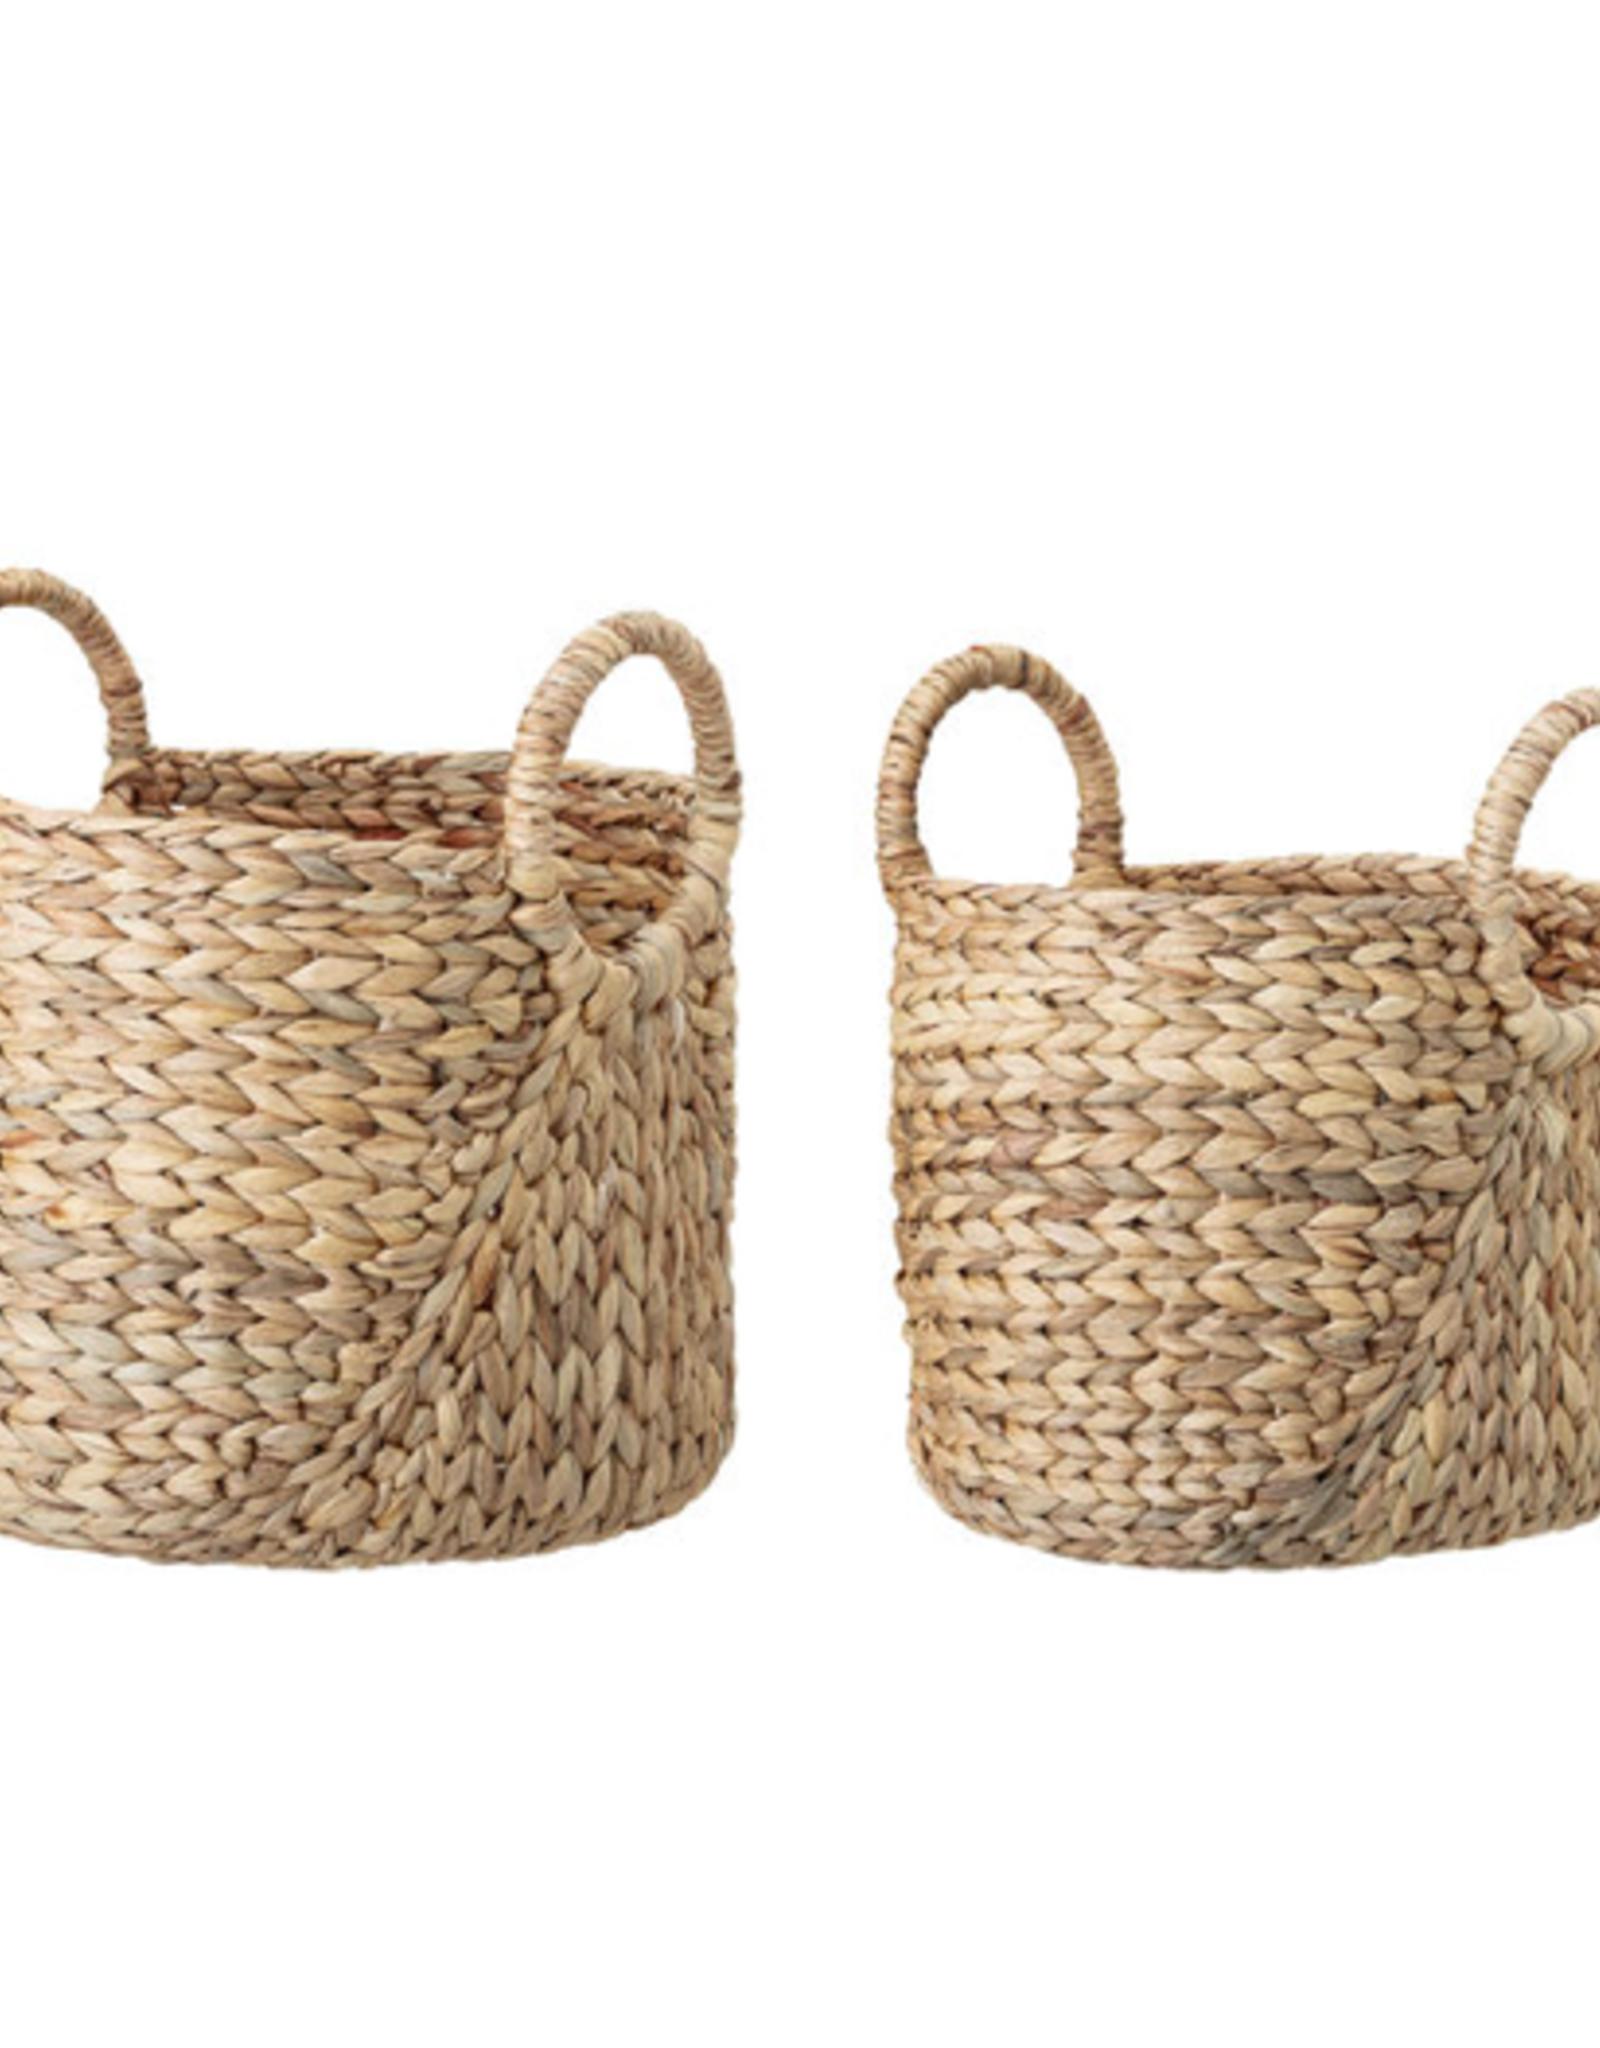 Bloomingville Bloomingville - Basket Nature water hyacinth model 2 L